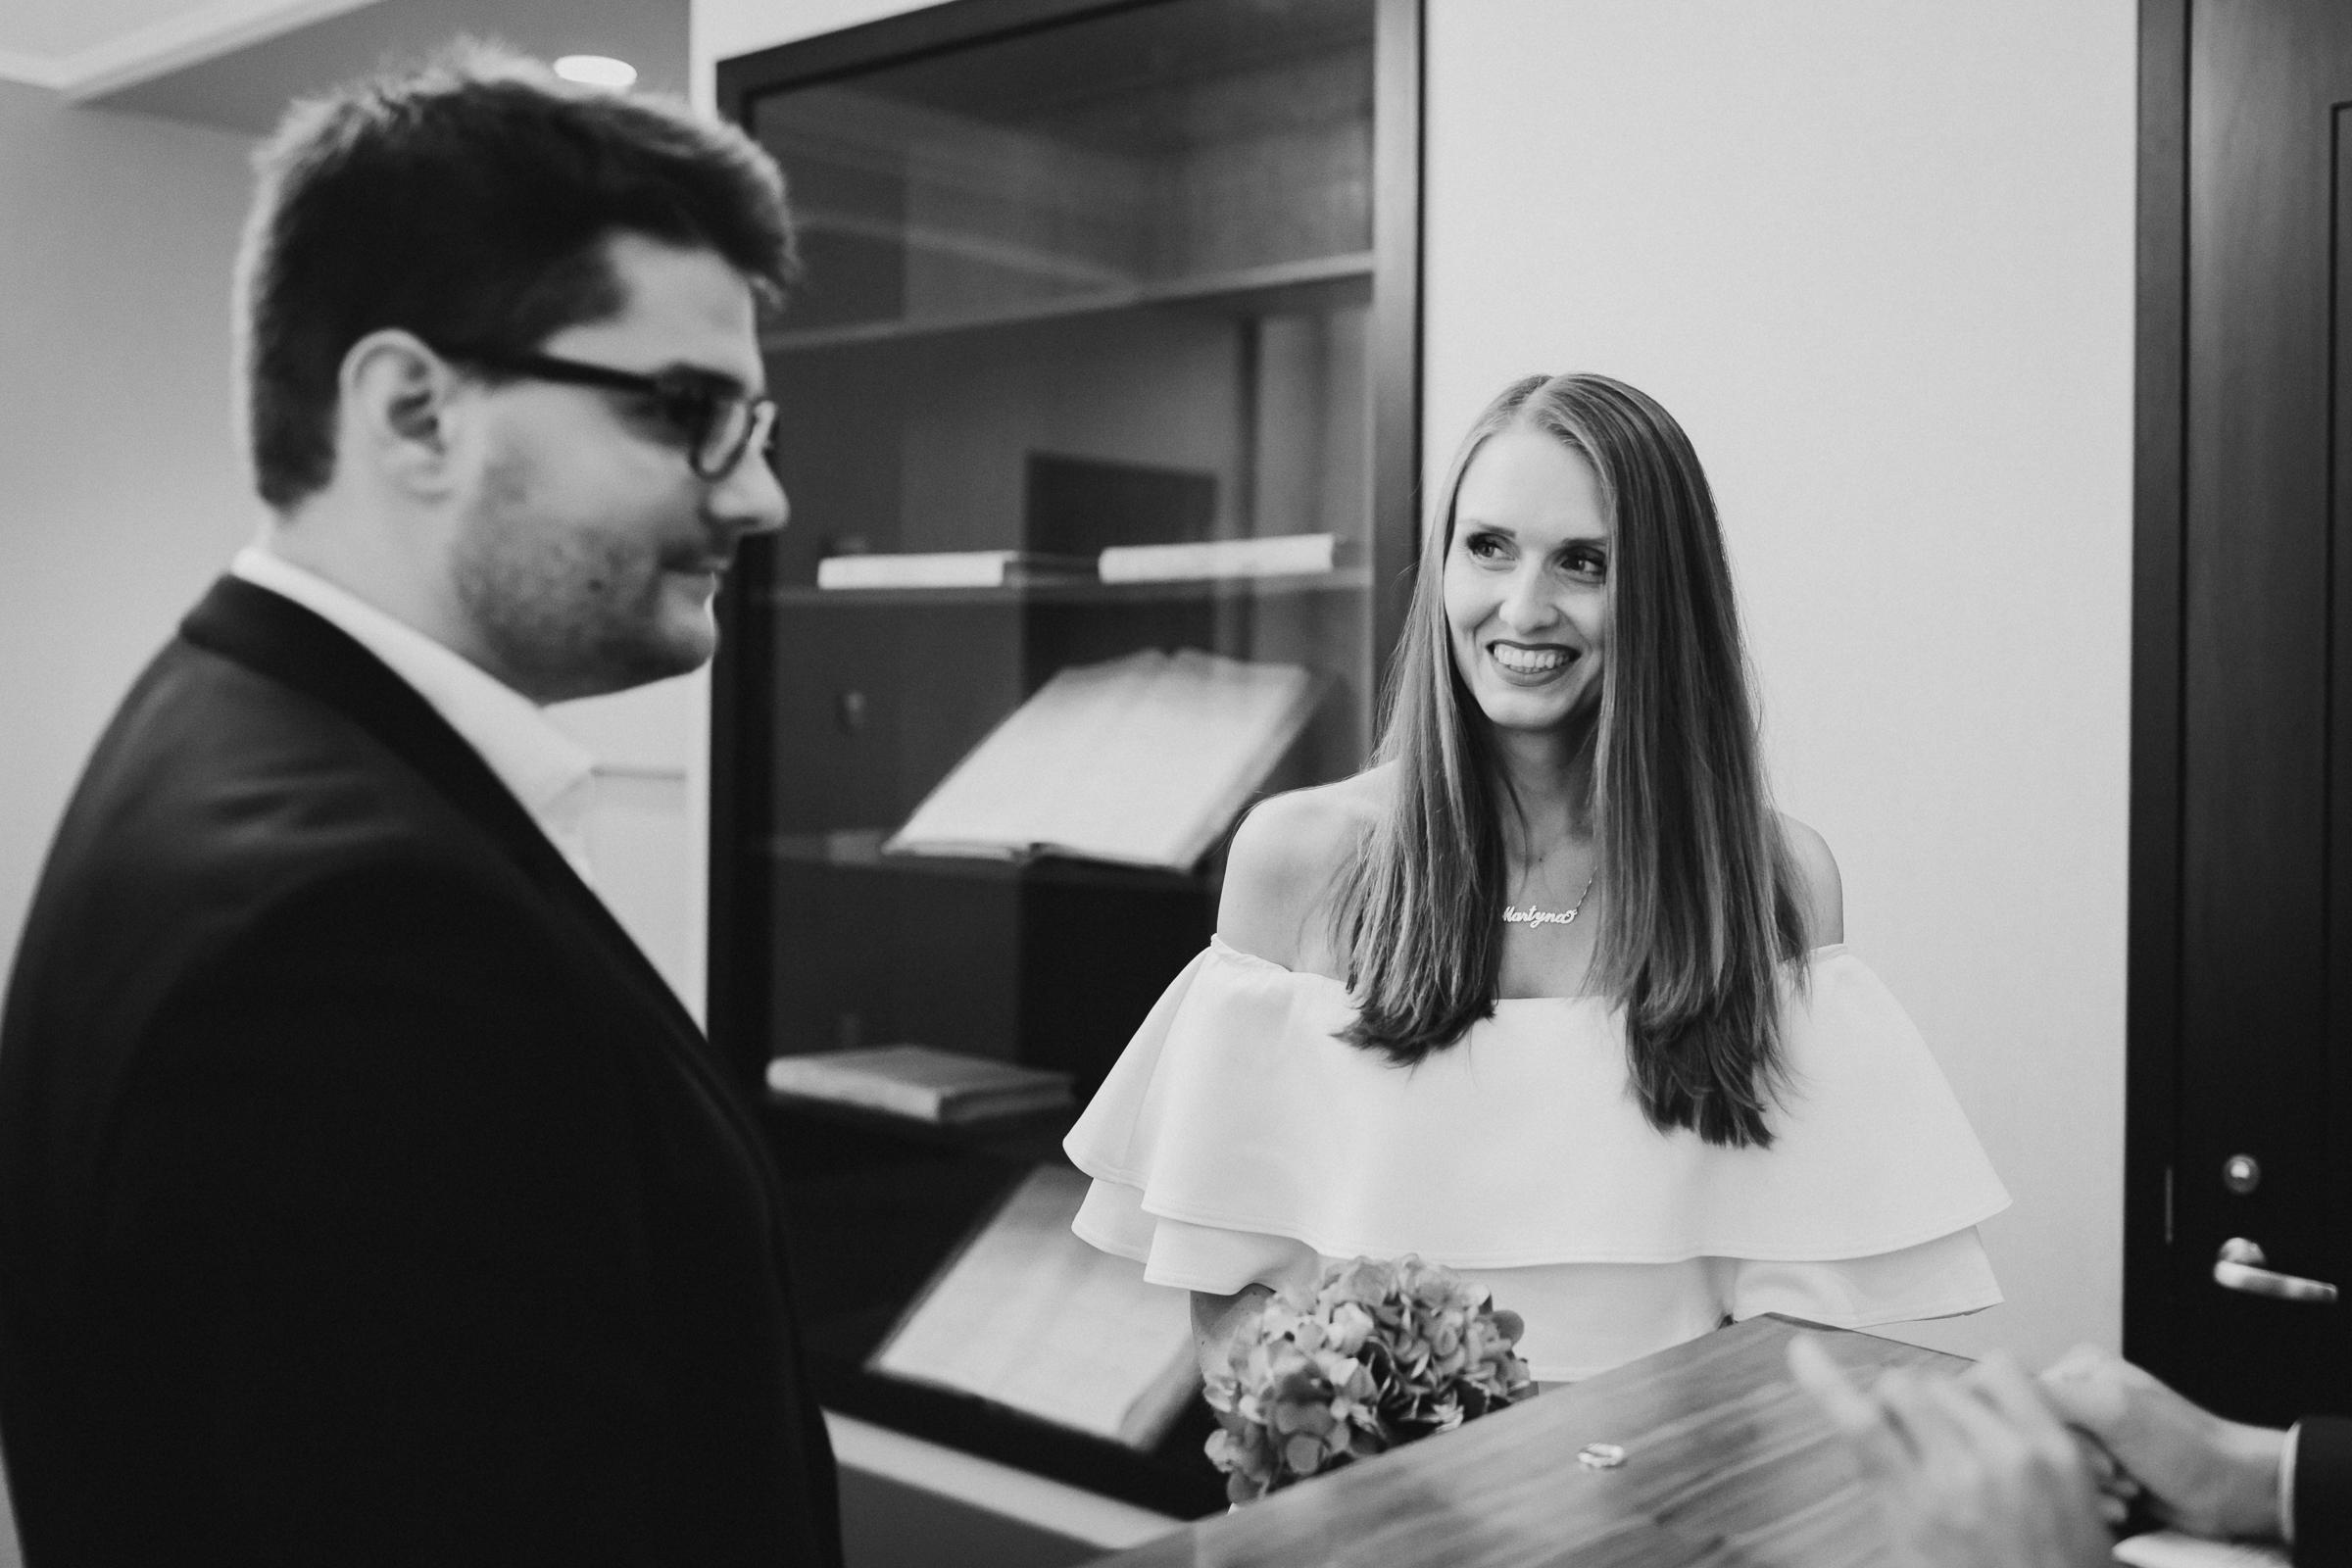 New-York-City-Hall-Elopement-NYC-Documentary-Wedding-Photographer-19.jpg